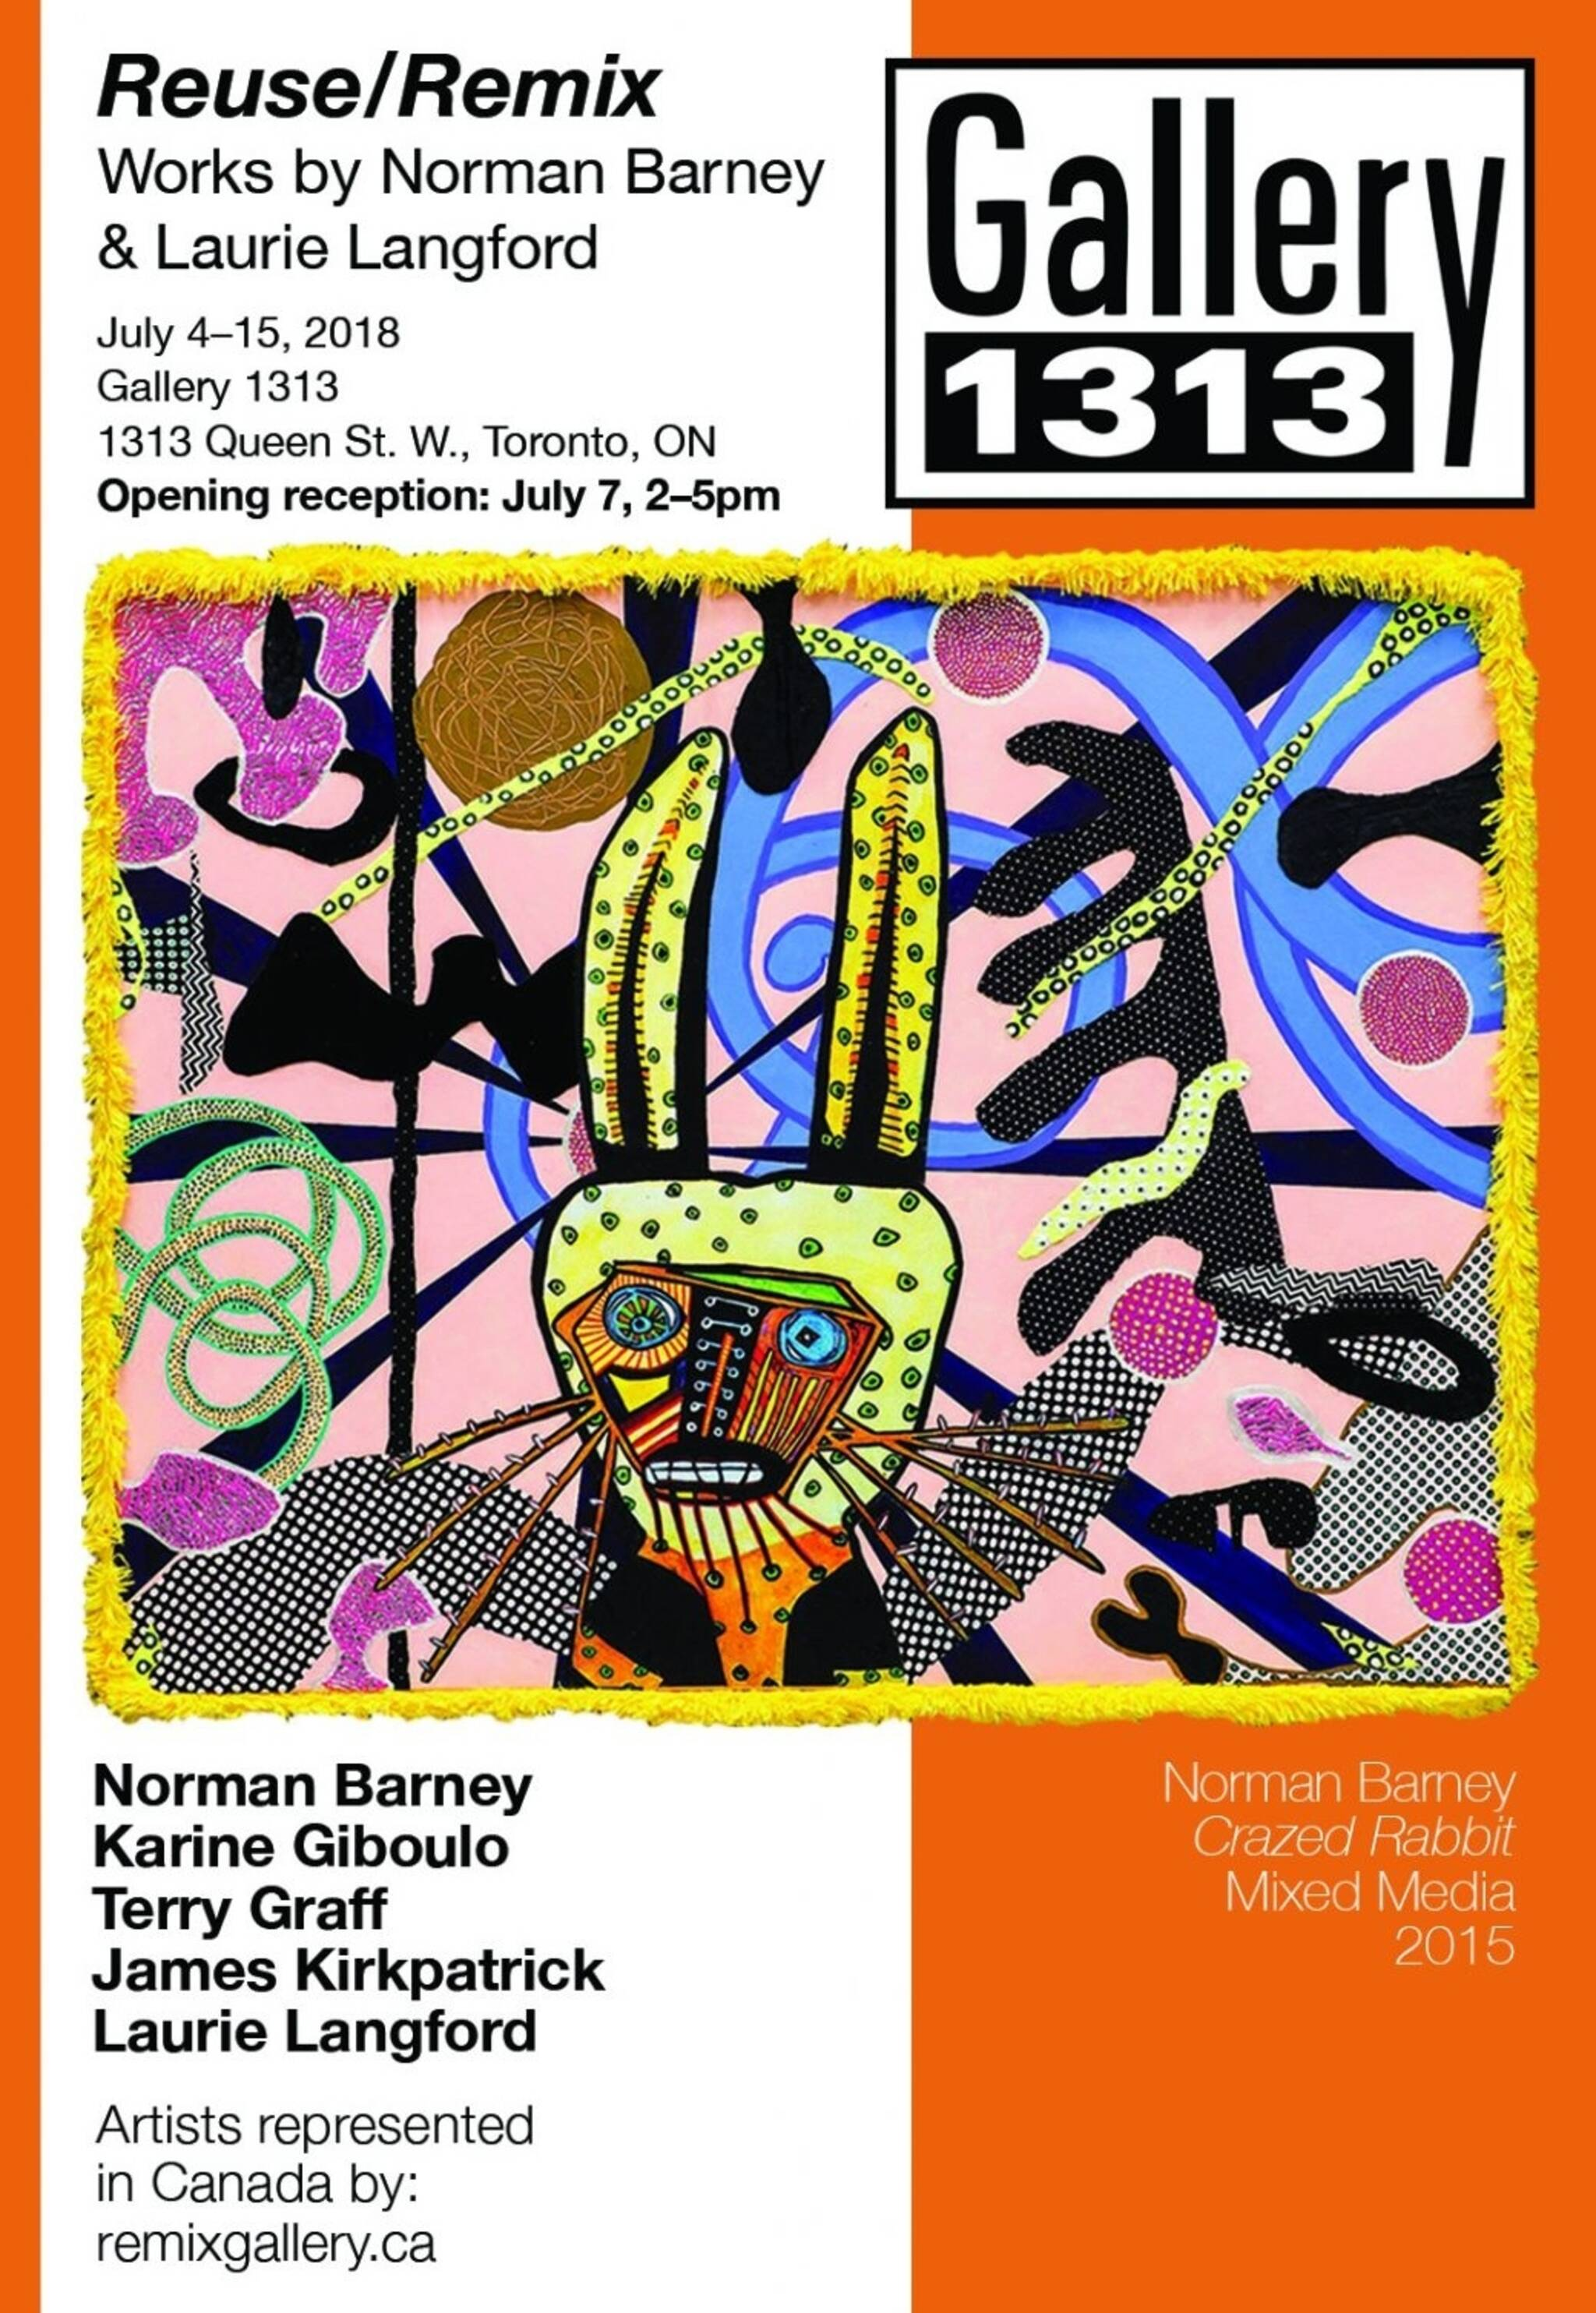 Norm Barney & Laurie Langford - REUSE & REMIX